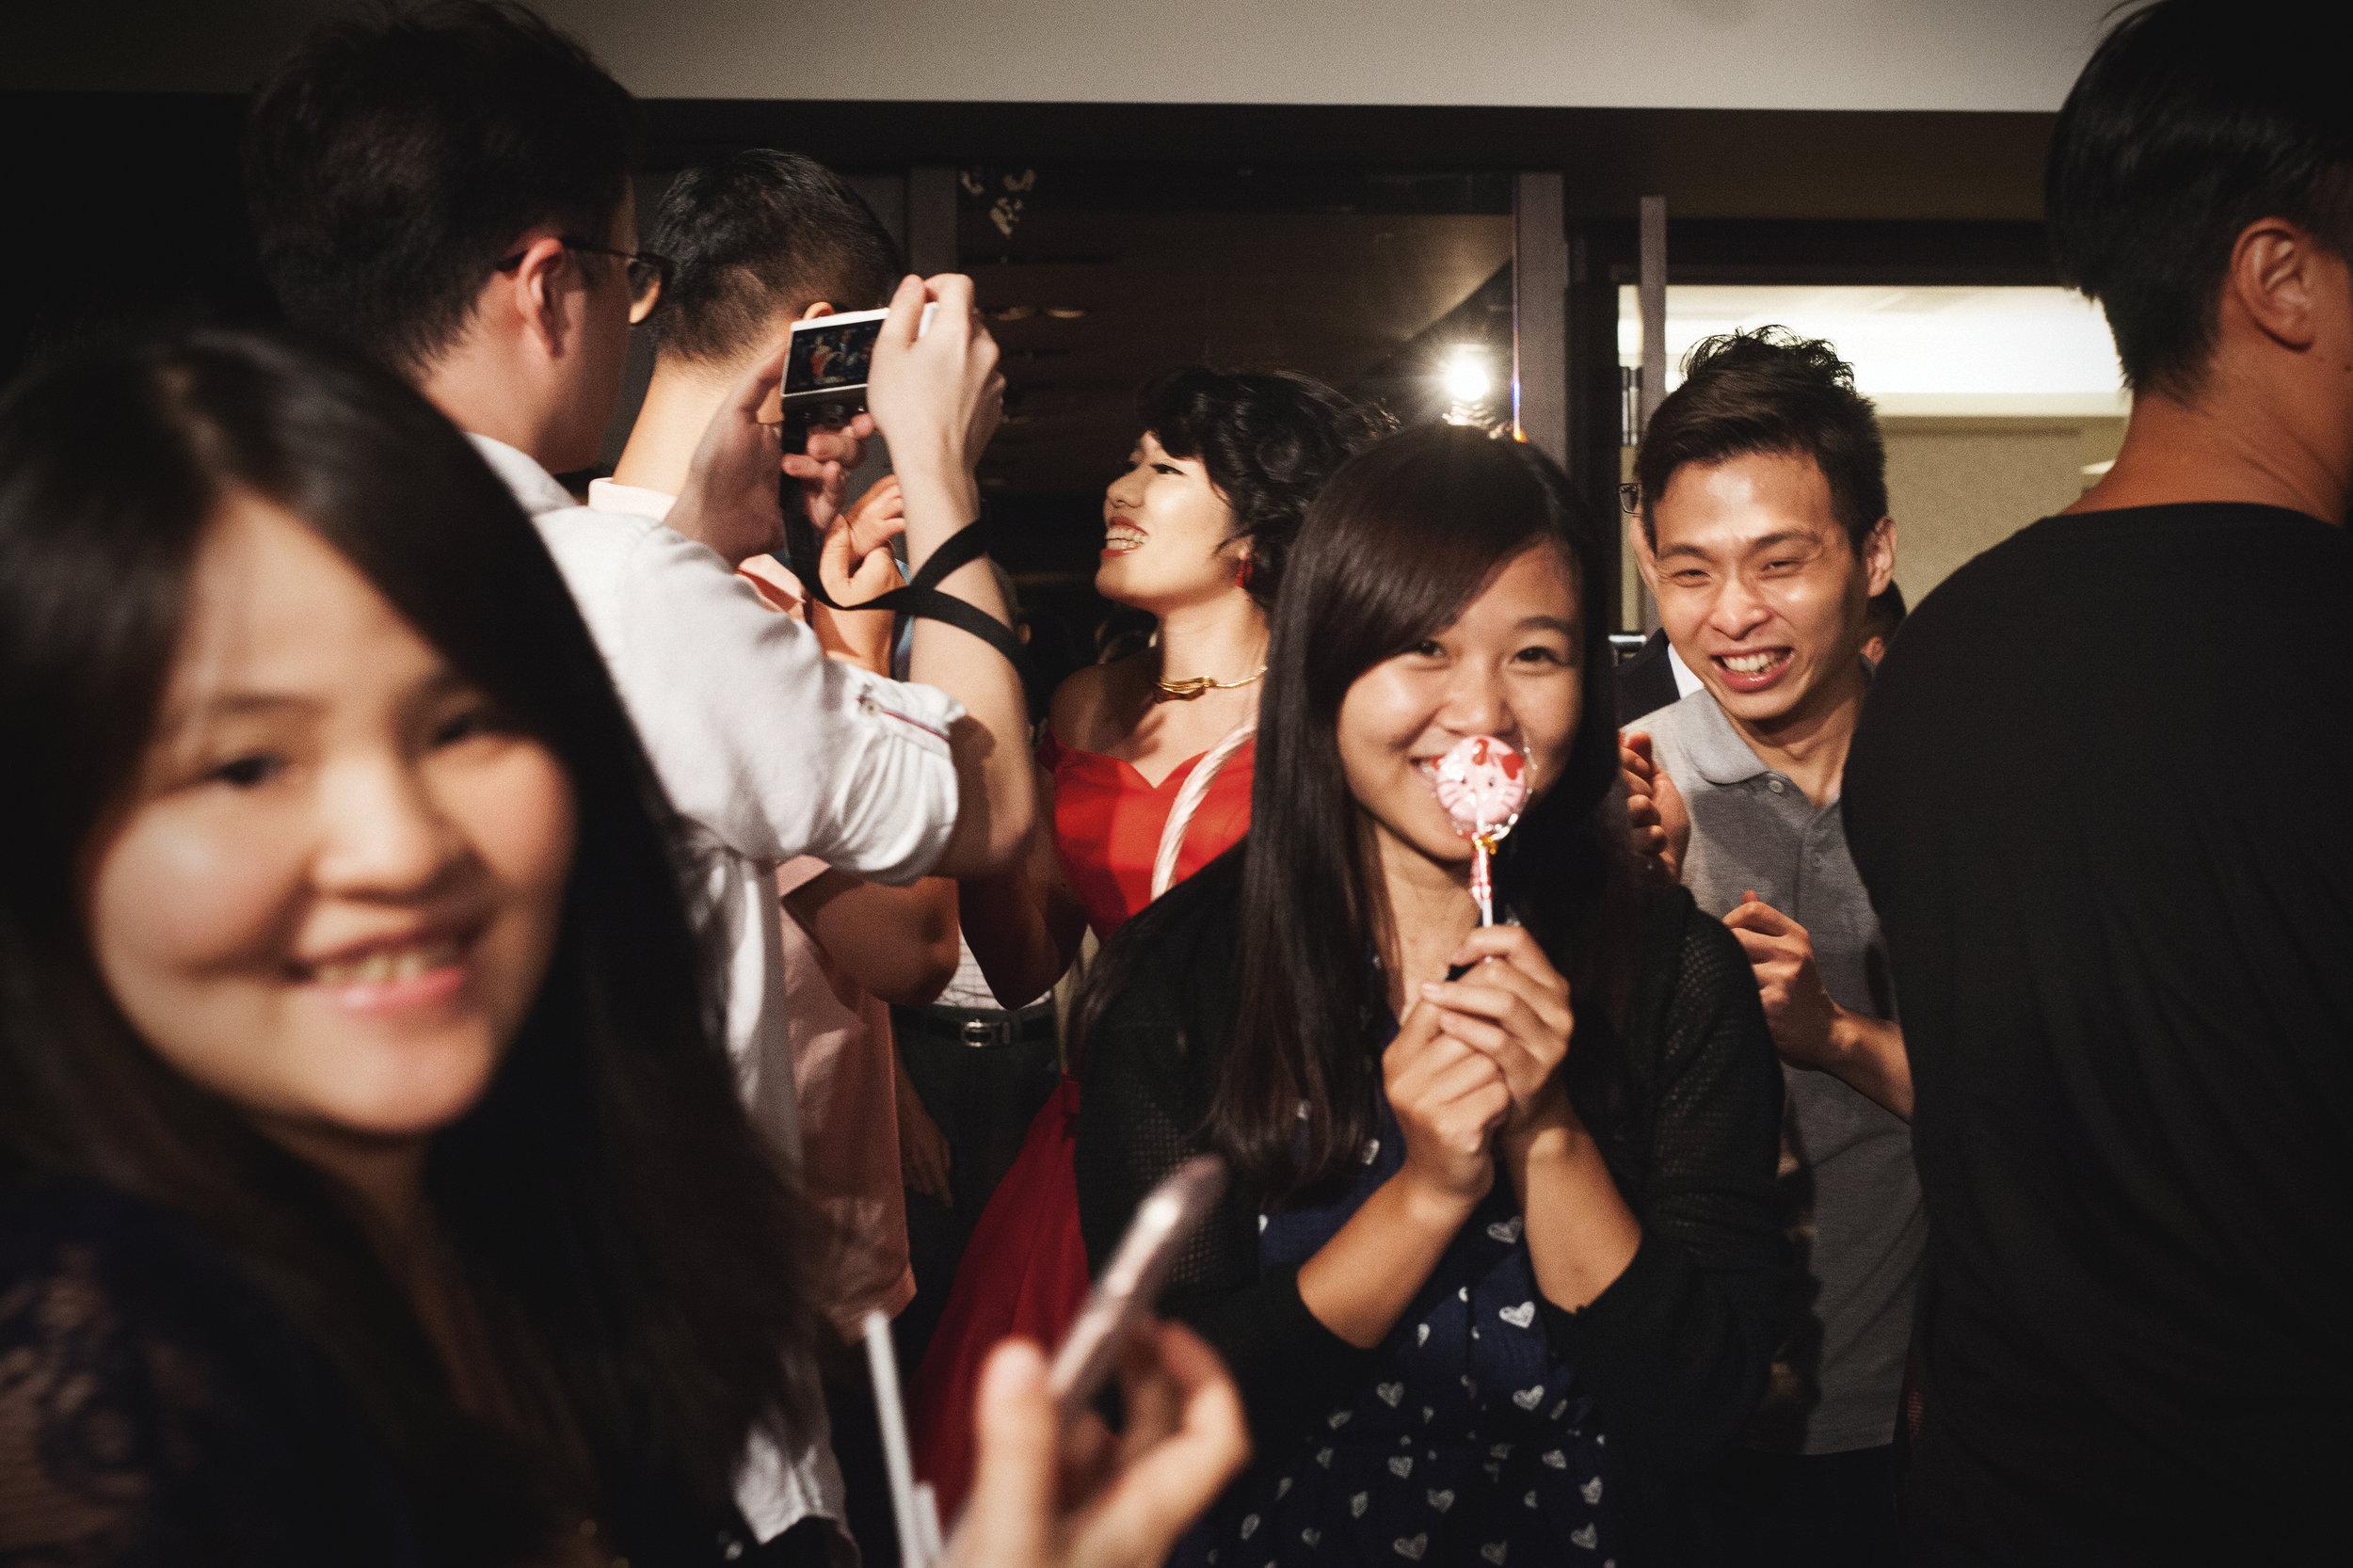 [JC]CREATIVE 女性攝影師 北投儷宴會館 補請台灣WEDDING    自然風格 台北婚攝推 女婚攝  桃園婚攝   圖像00221.JPG